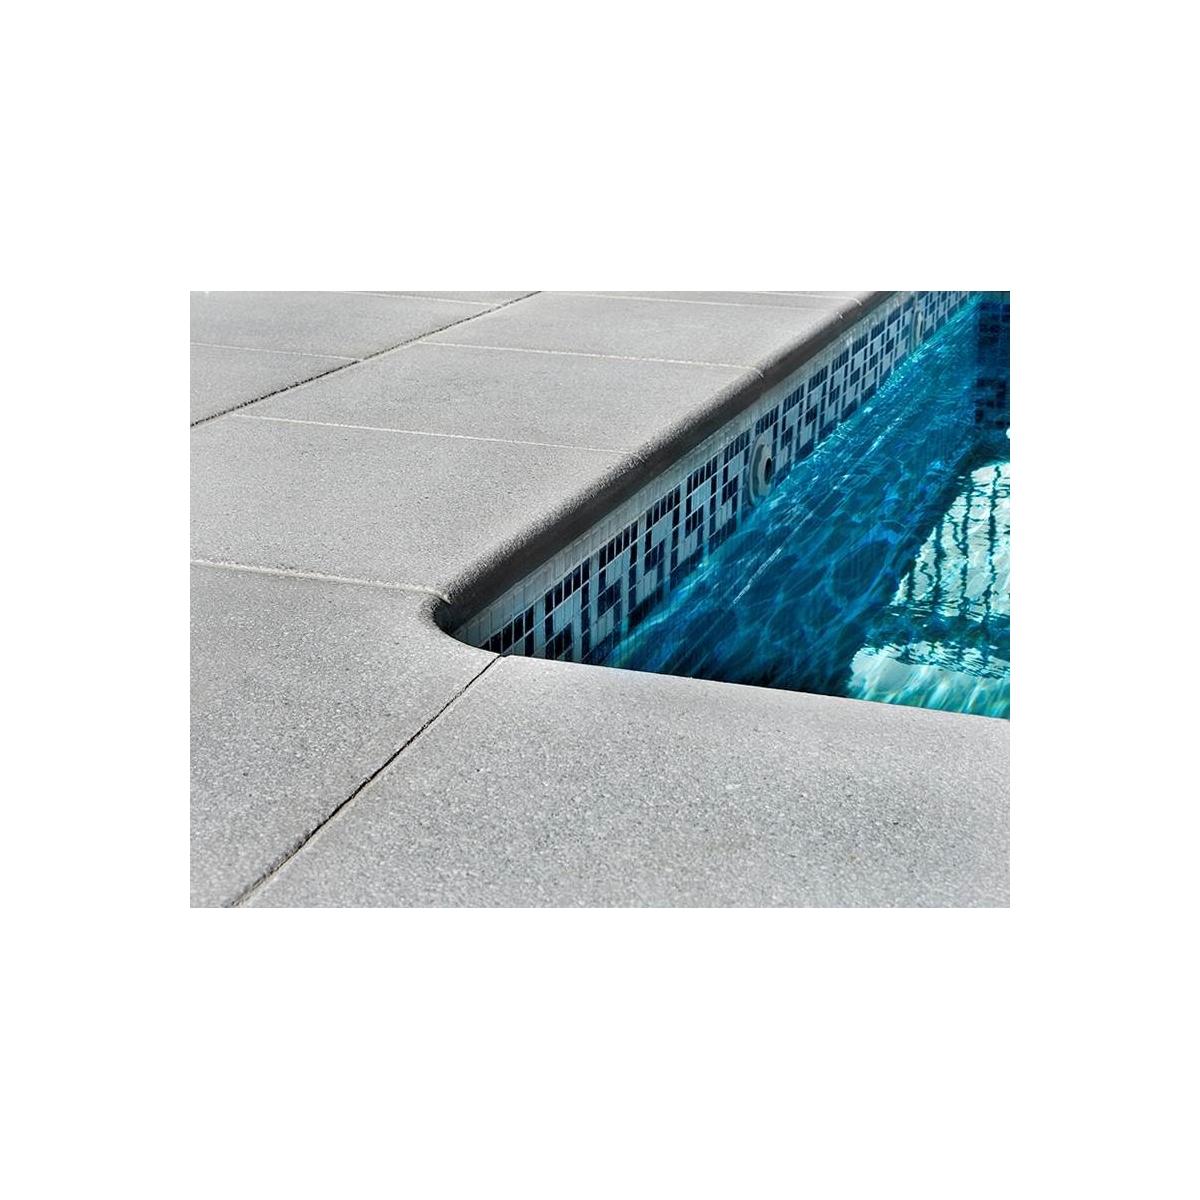 Borde de piscina esquina invertida Jerez Prefabricados López